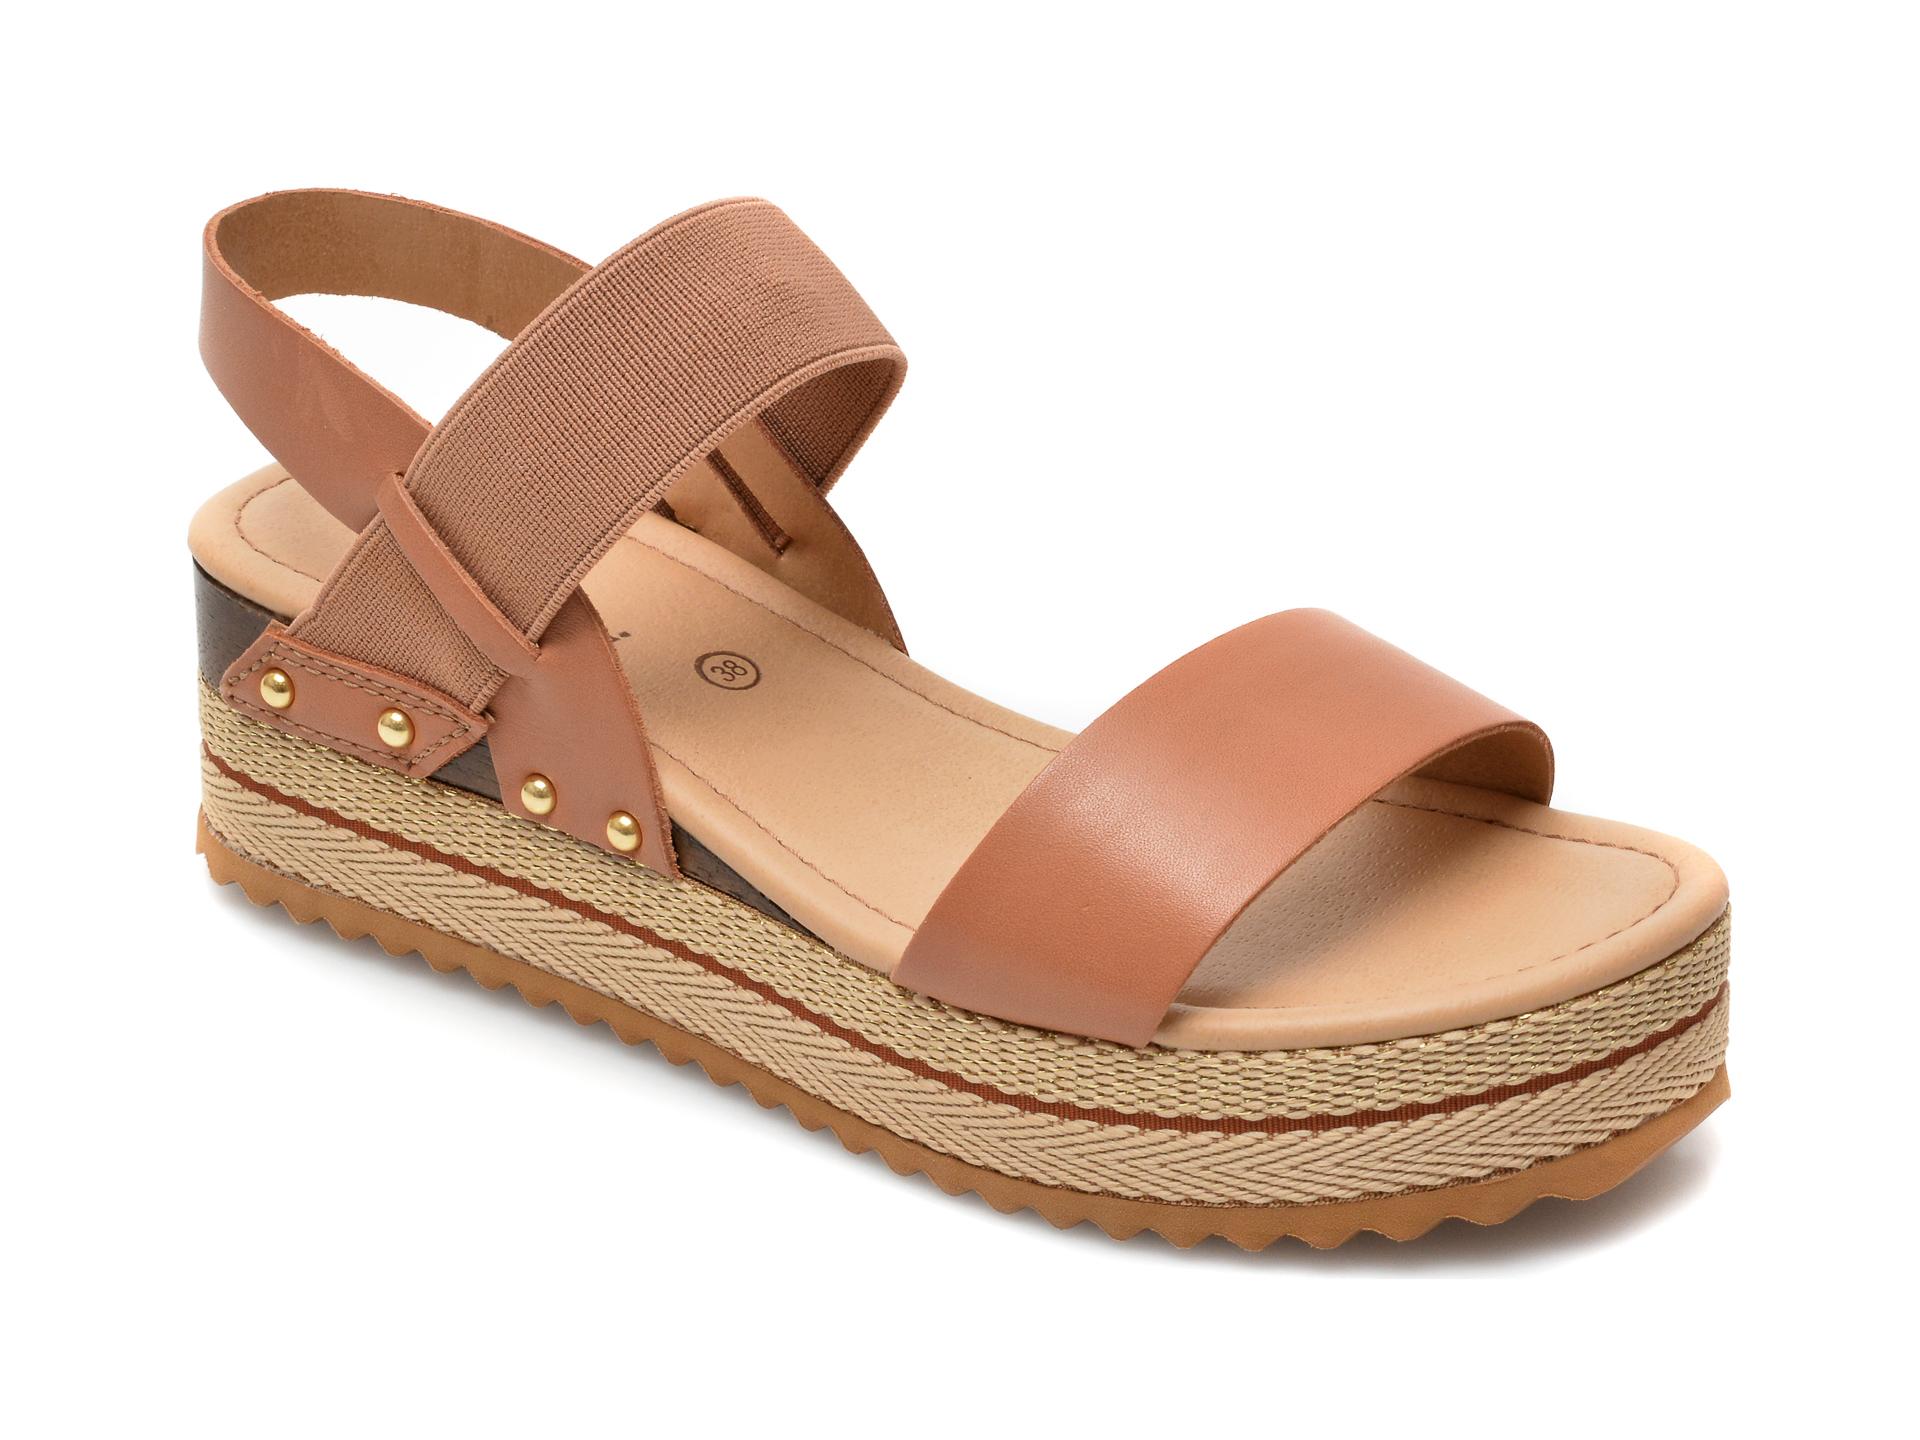 Sandale FLAVIA PASSINI maro, 320801, din piele naturala imagine otter.ro 2021